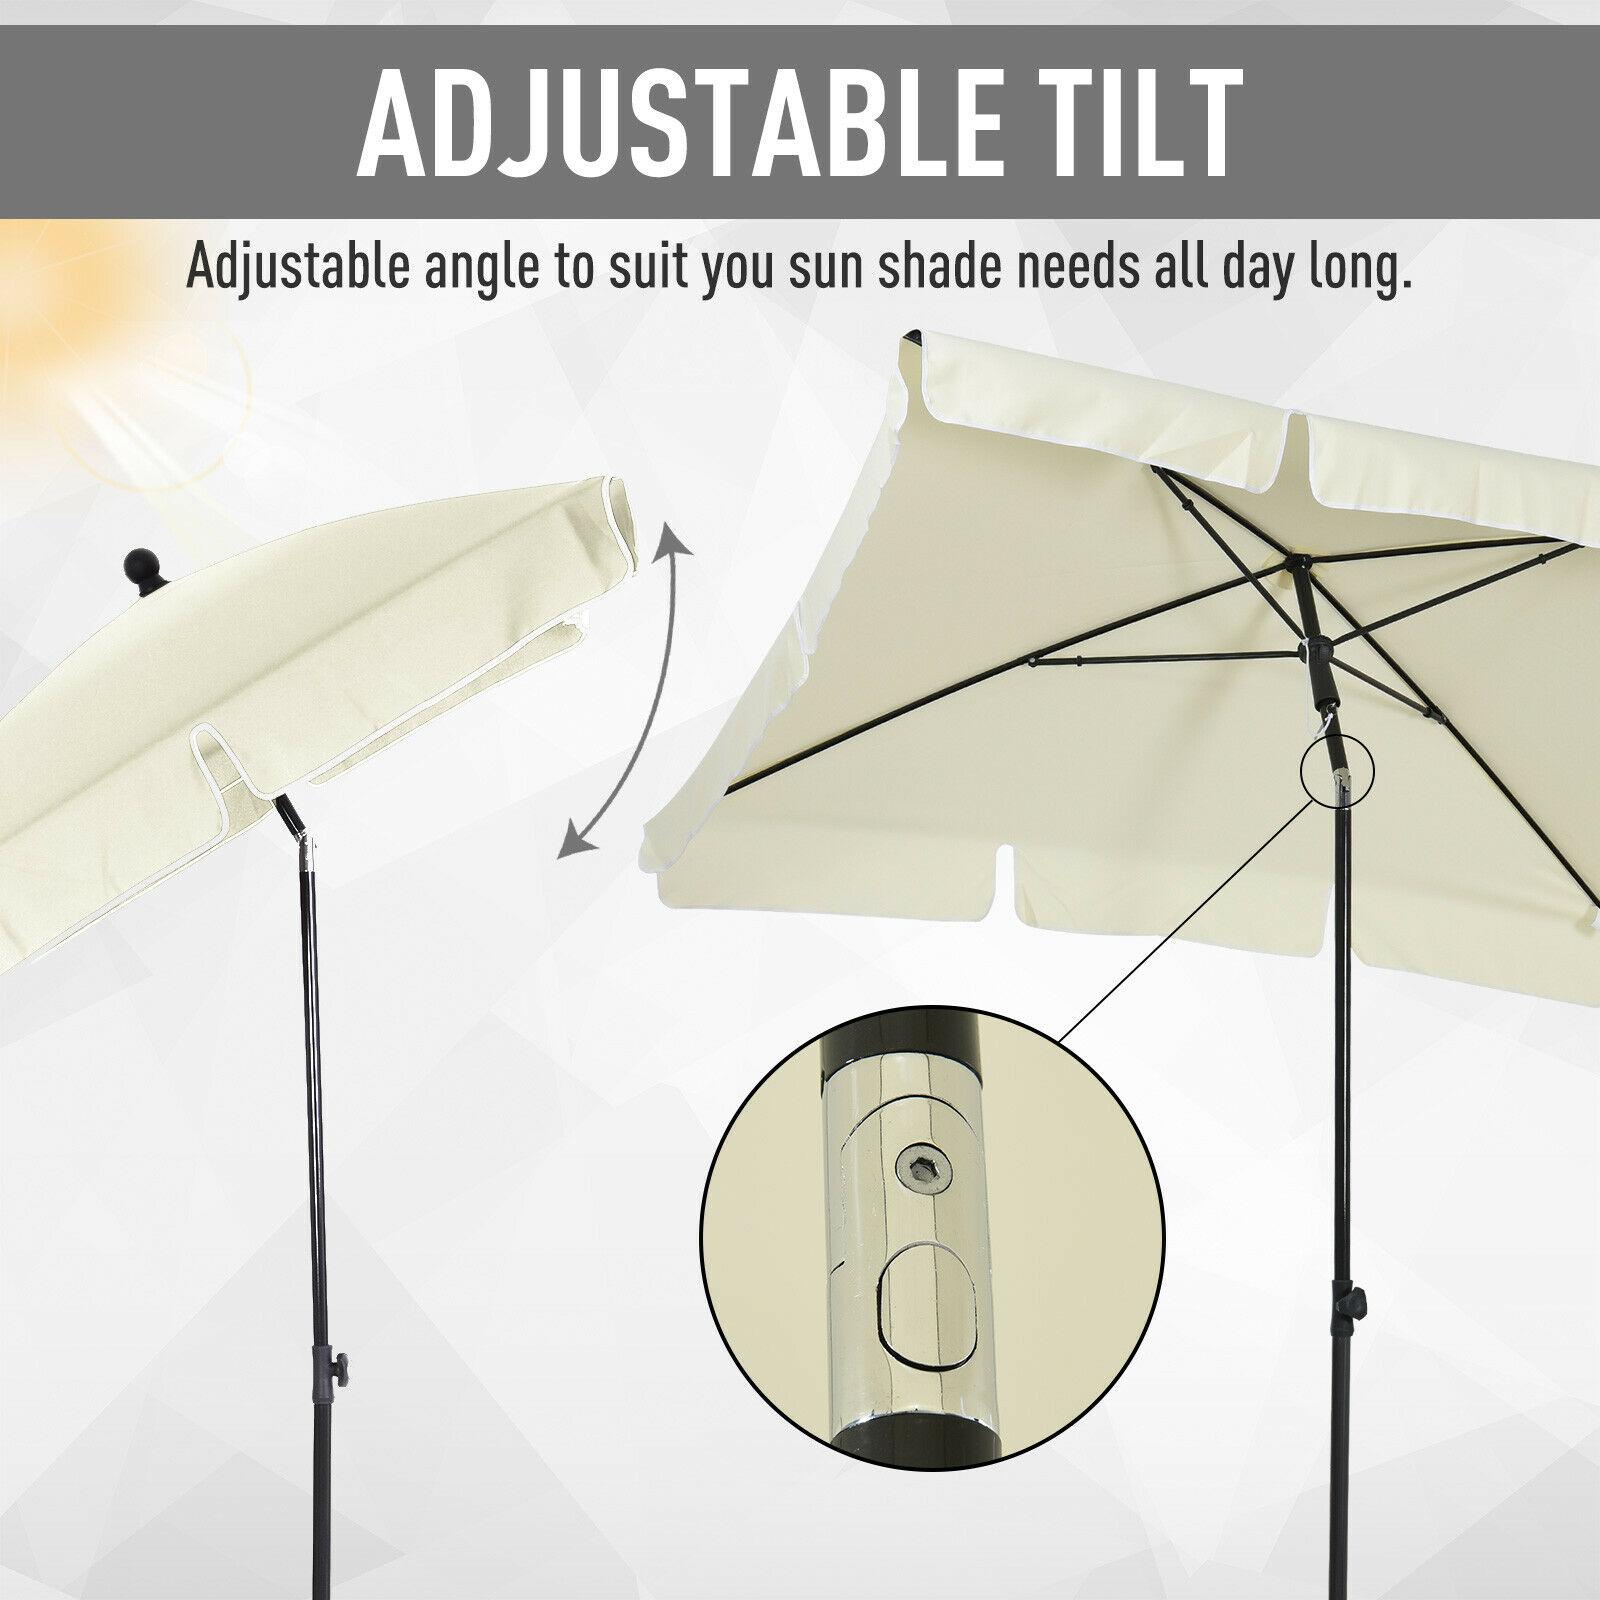 Outsunny Sun Shade Umbrella Parasol Patio Tilt Aluminium Cream White 2x1.25M - £27.99 using code @ eBay / Outsunny (UK Mainland)